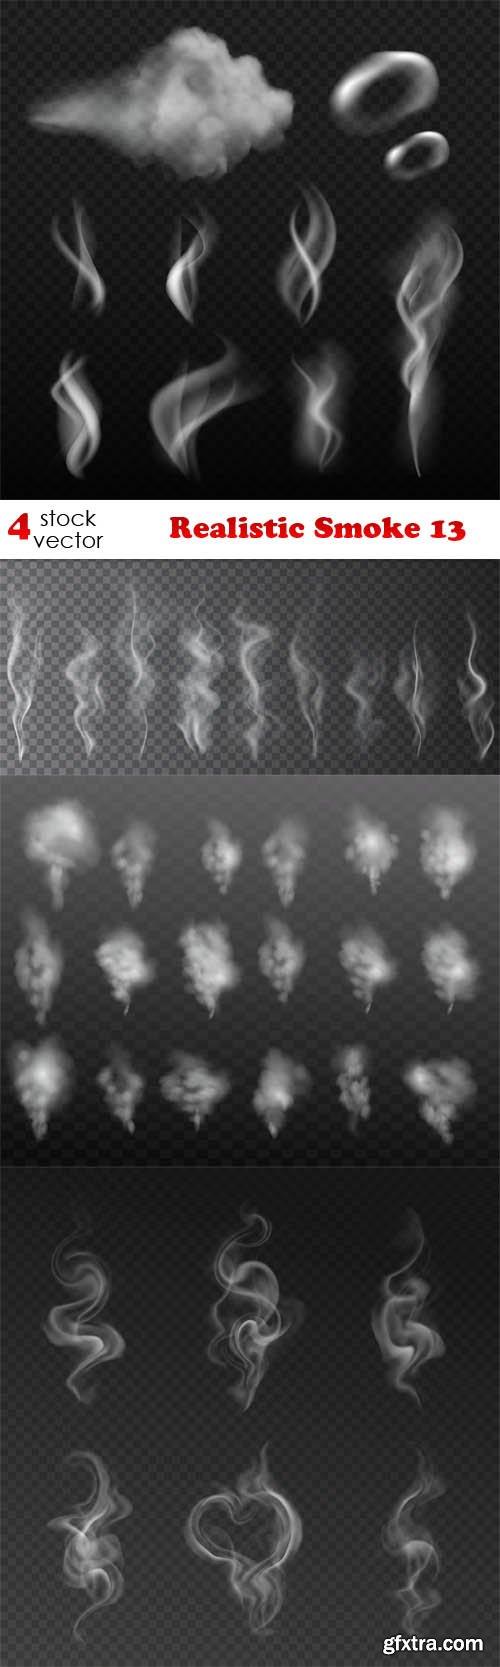 Vectors - Realistic Smoke 13